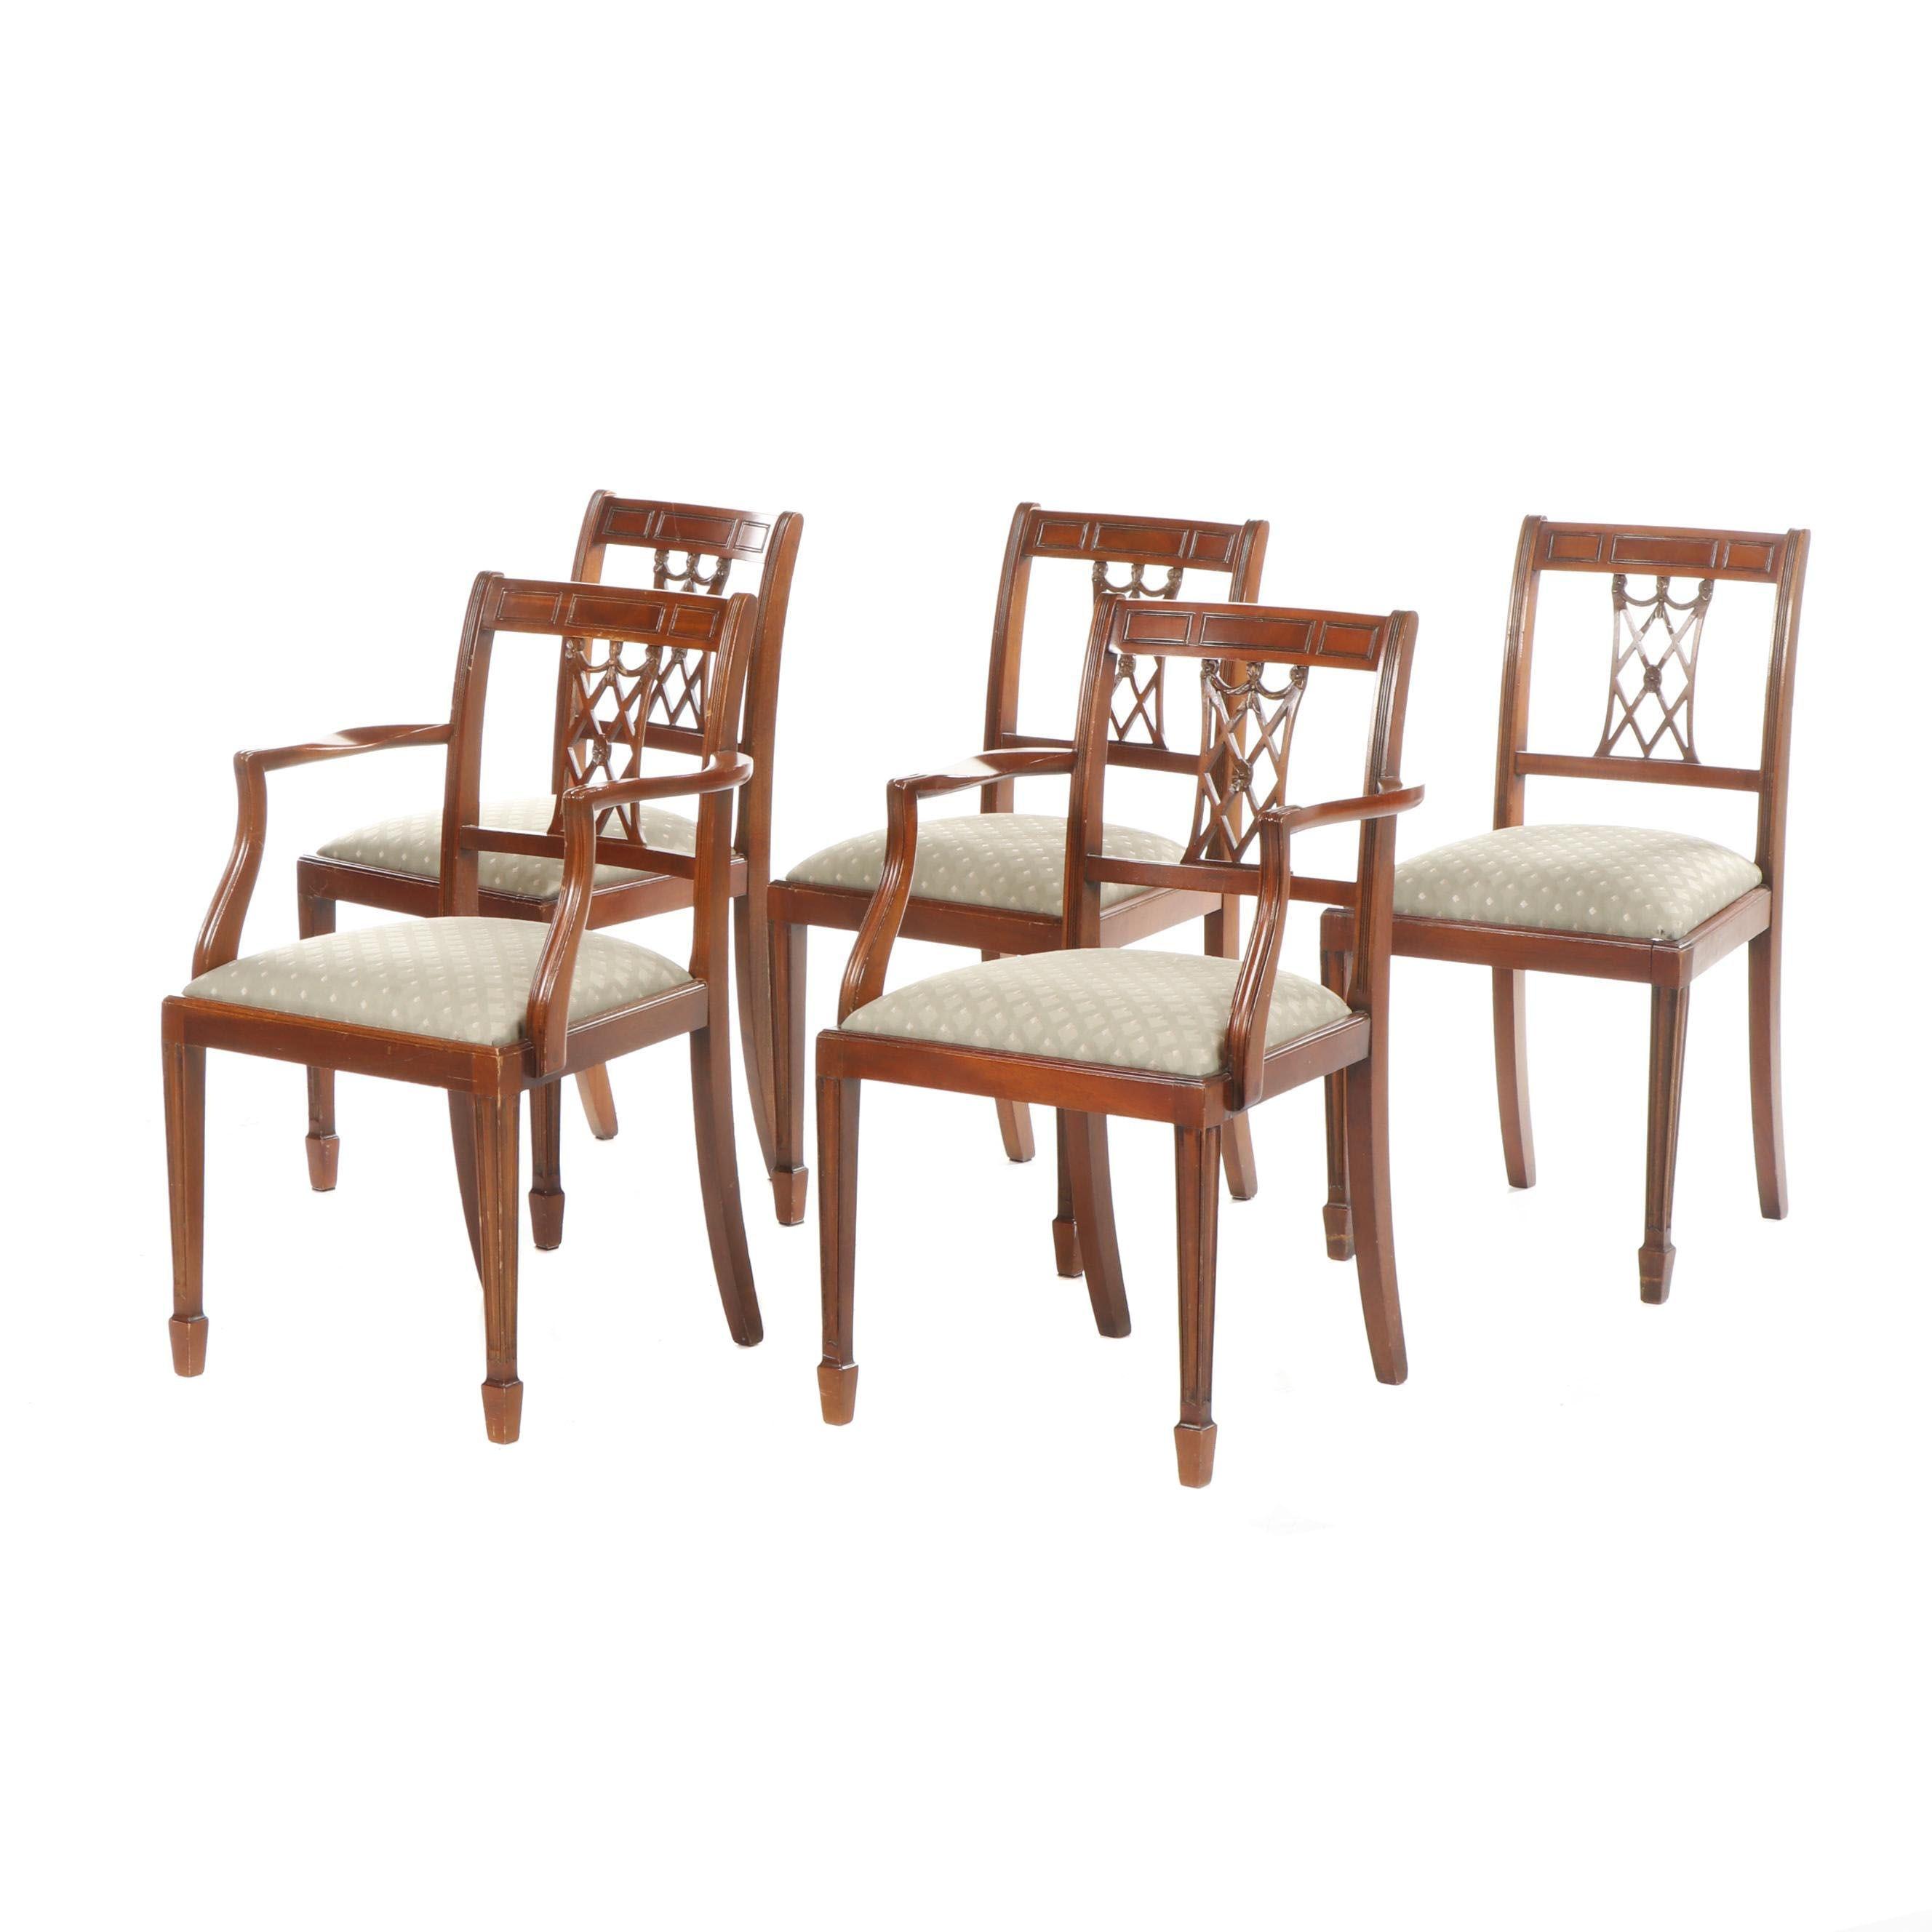 Shaw of London Lattice Back Federal Style Oak Chairs